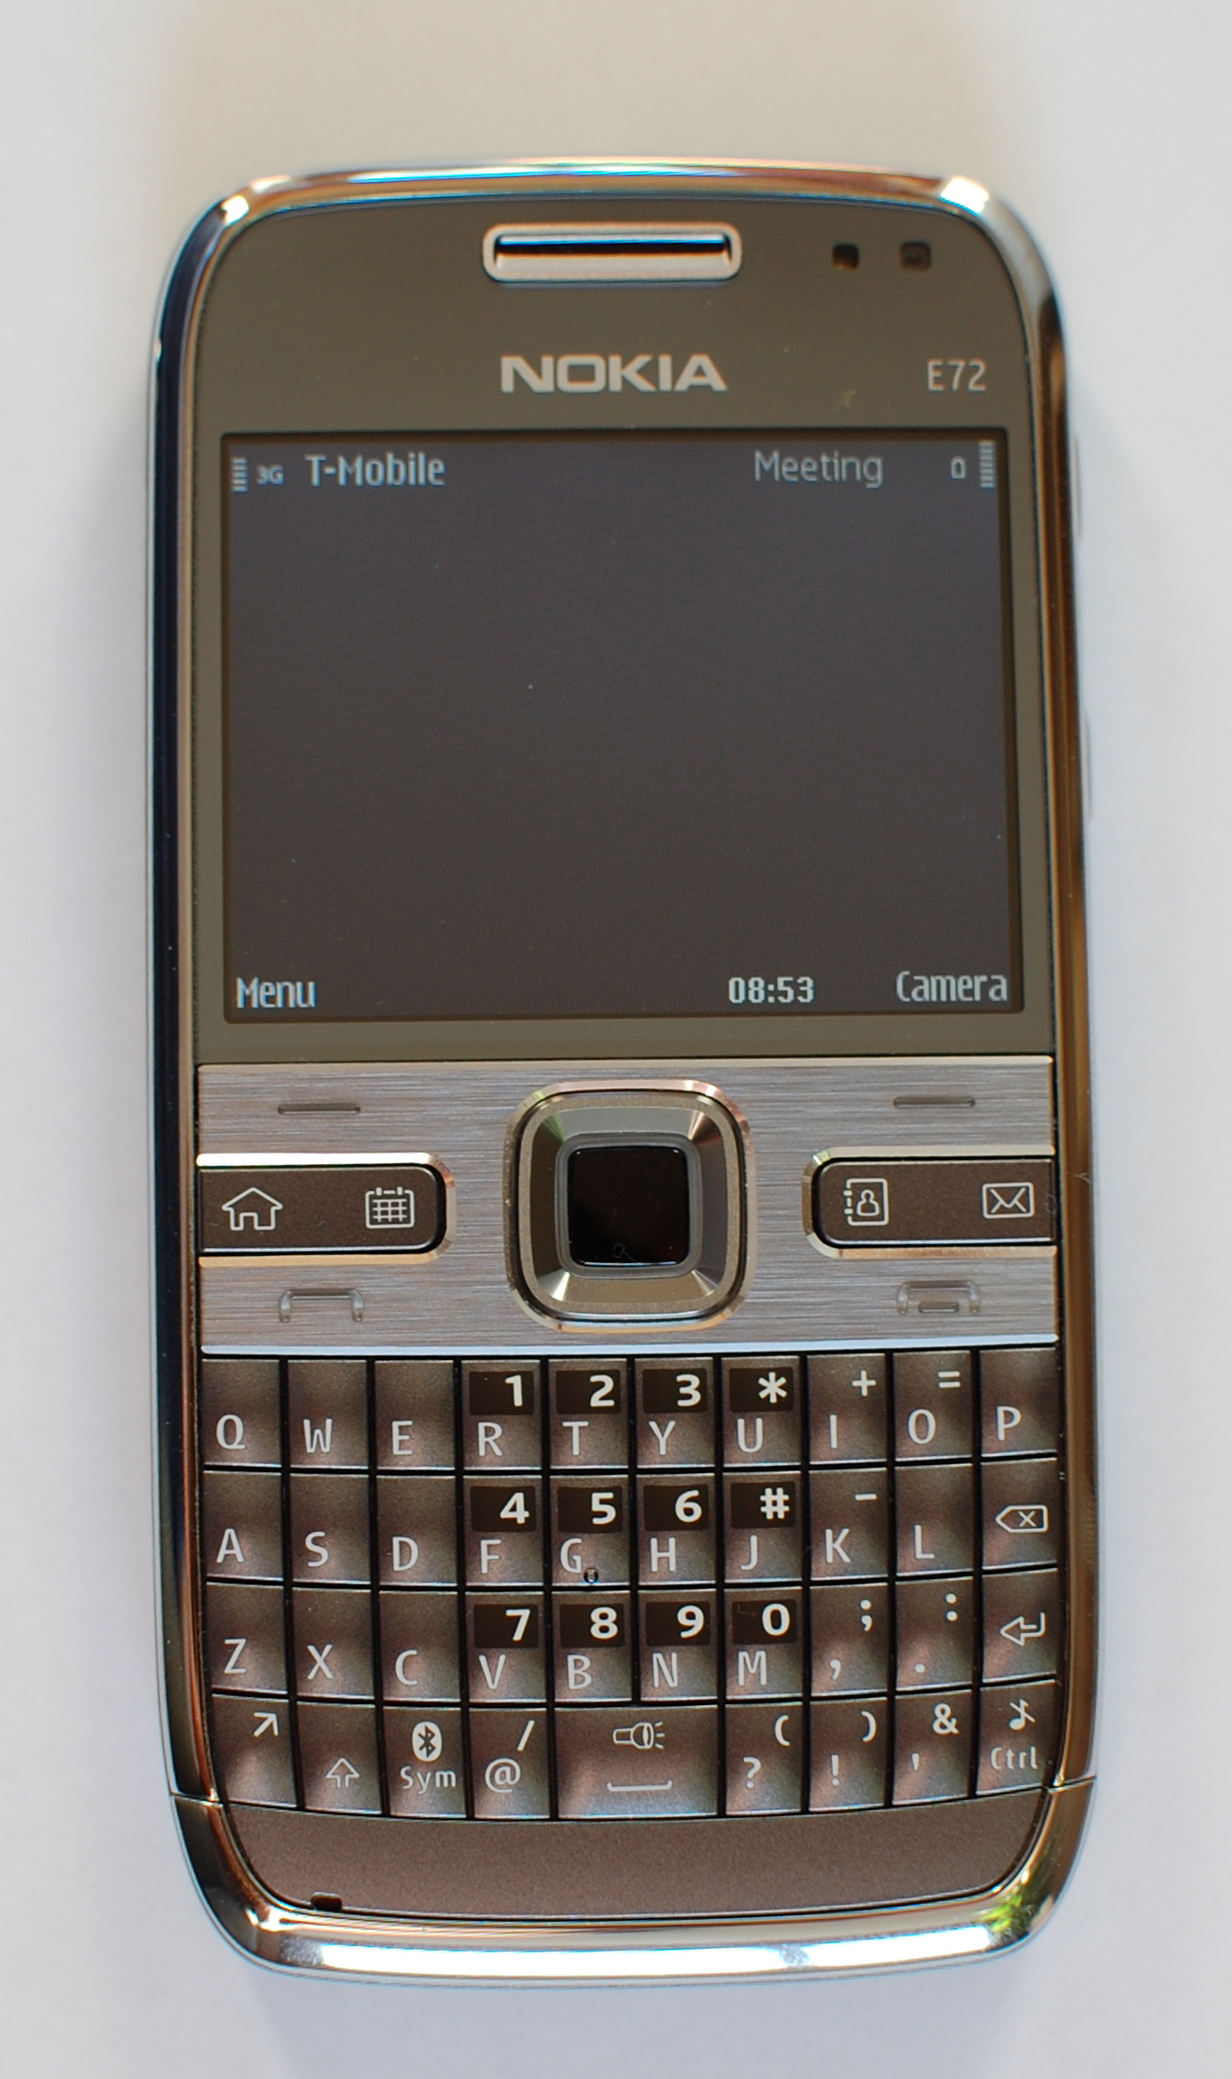 Nokia E72 - Wikipedia